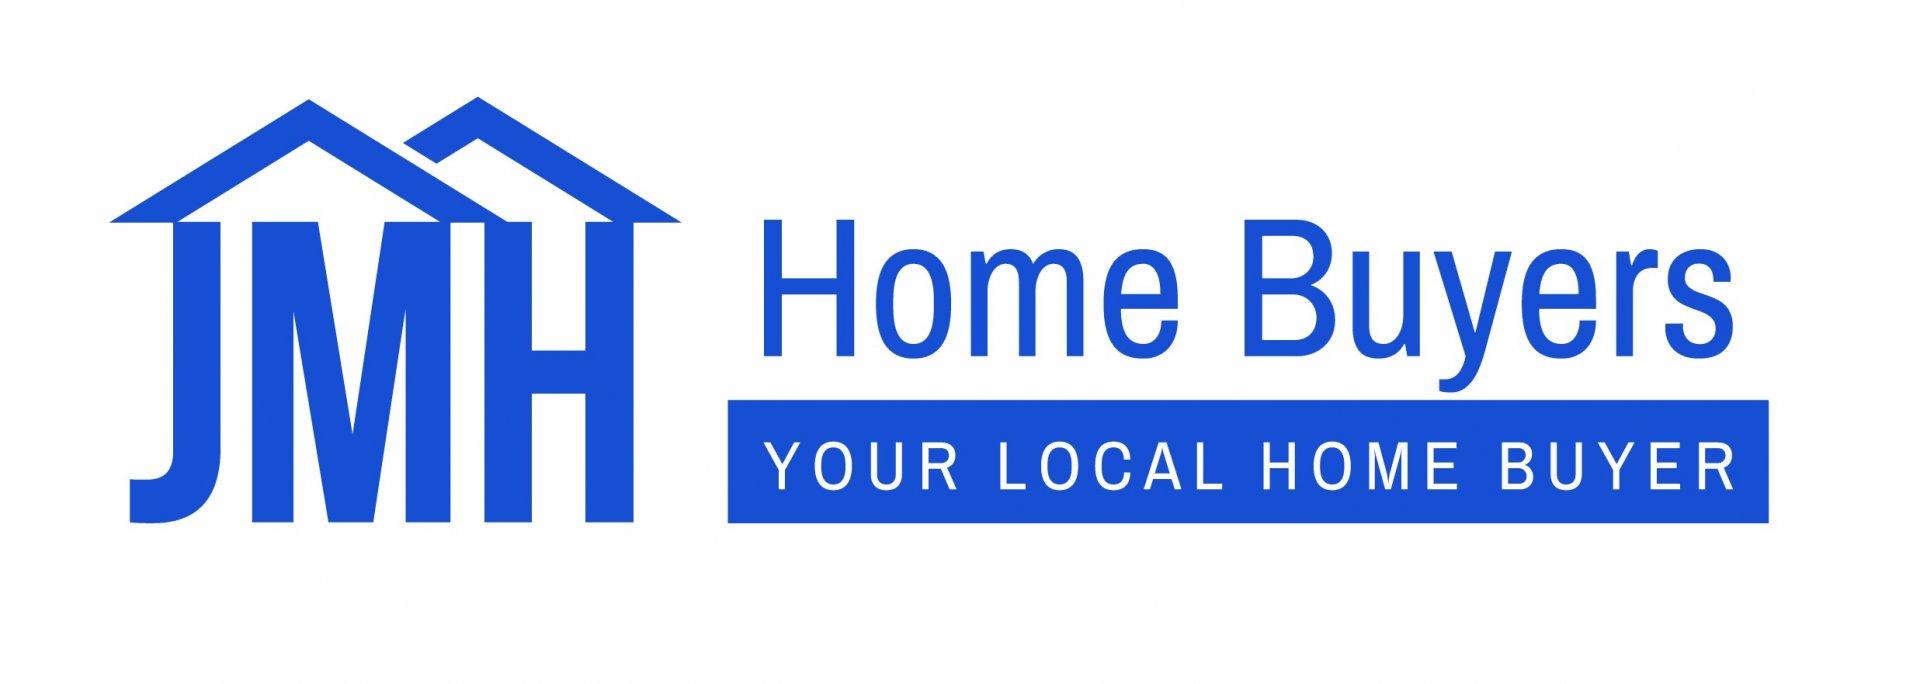 JMH Home Buyers logo